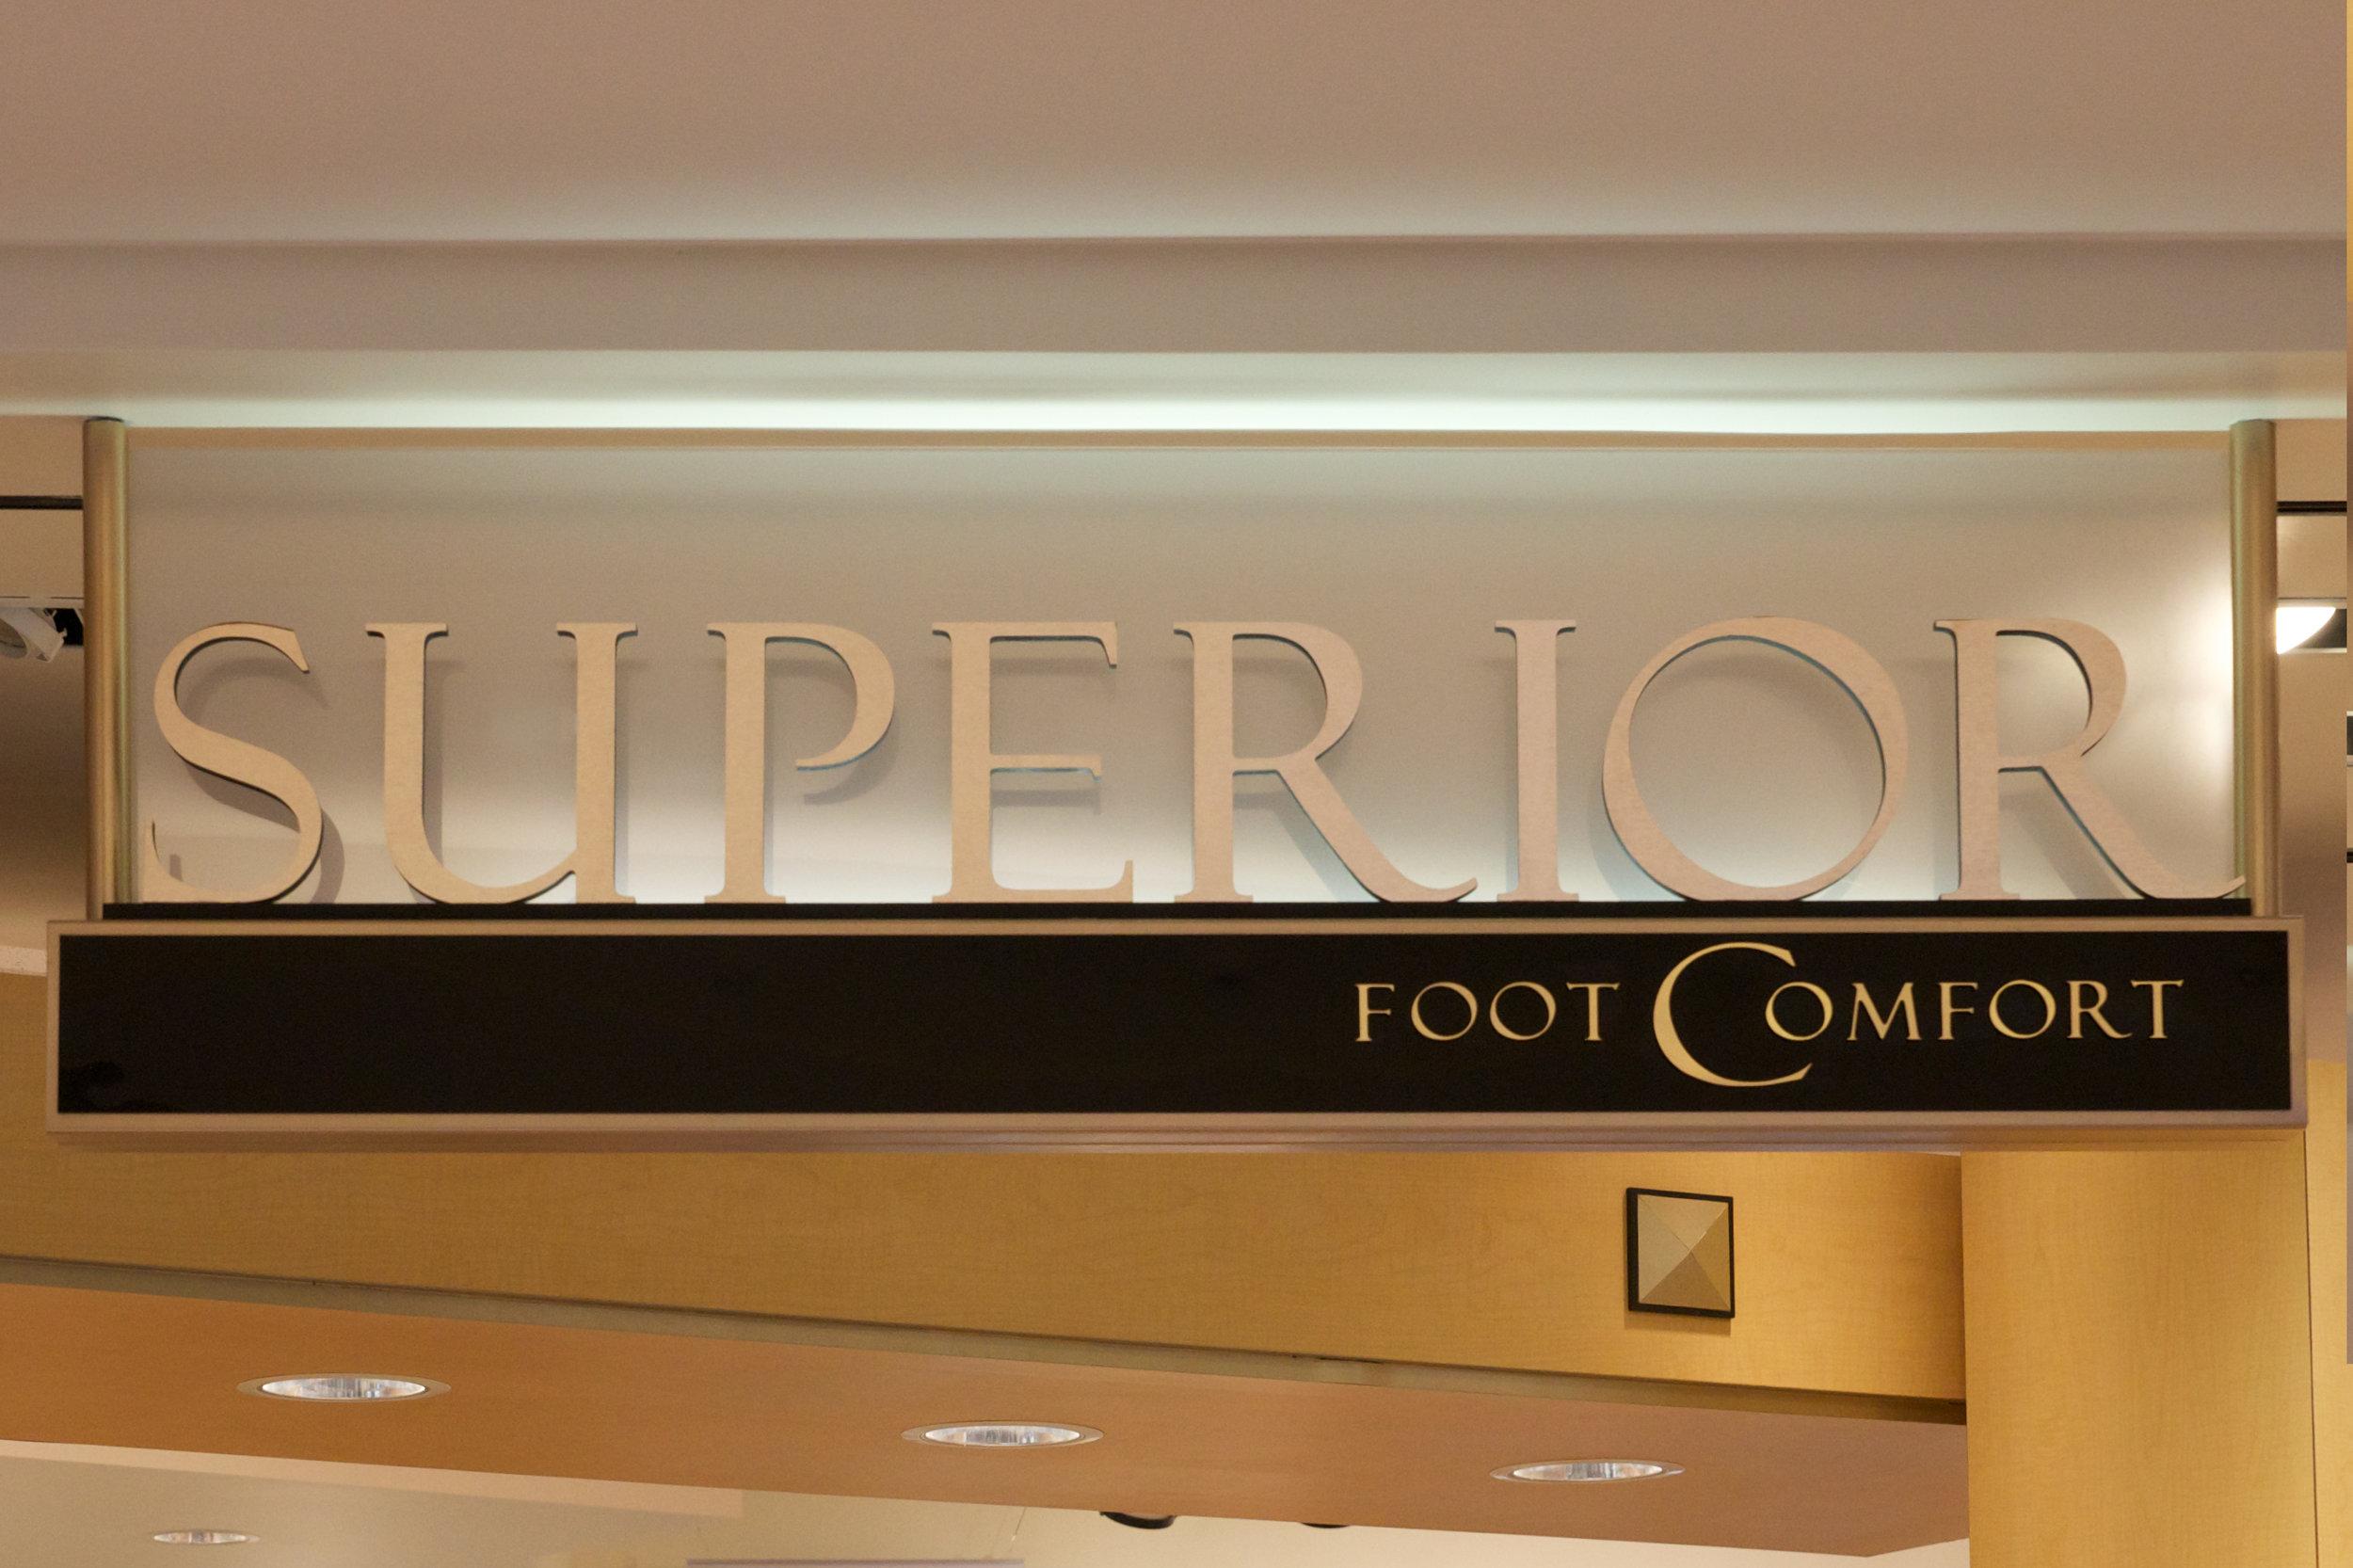 Superior Foot Comfort - 1 sign.jpg